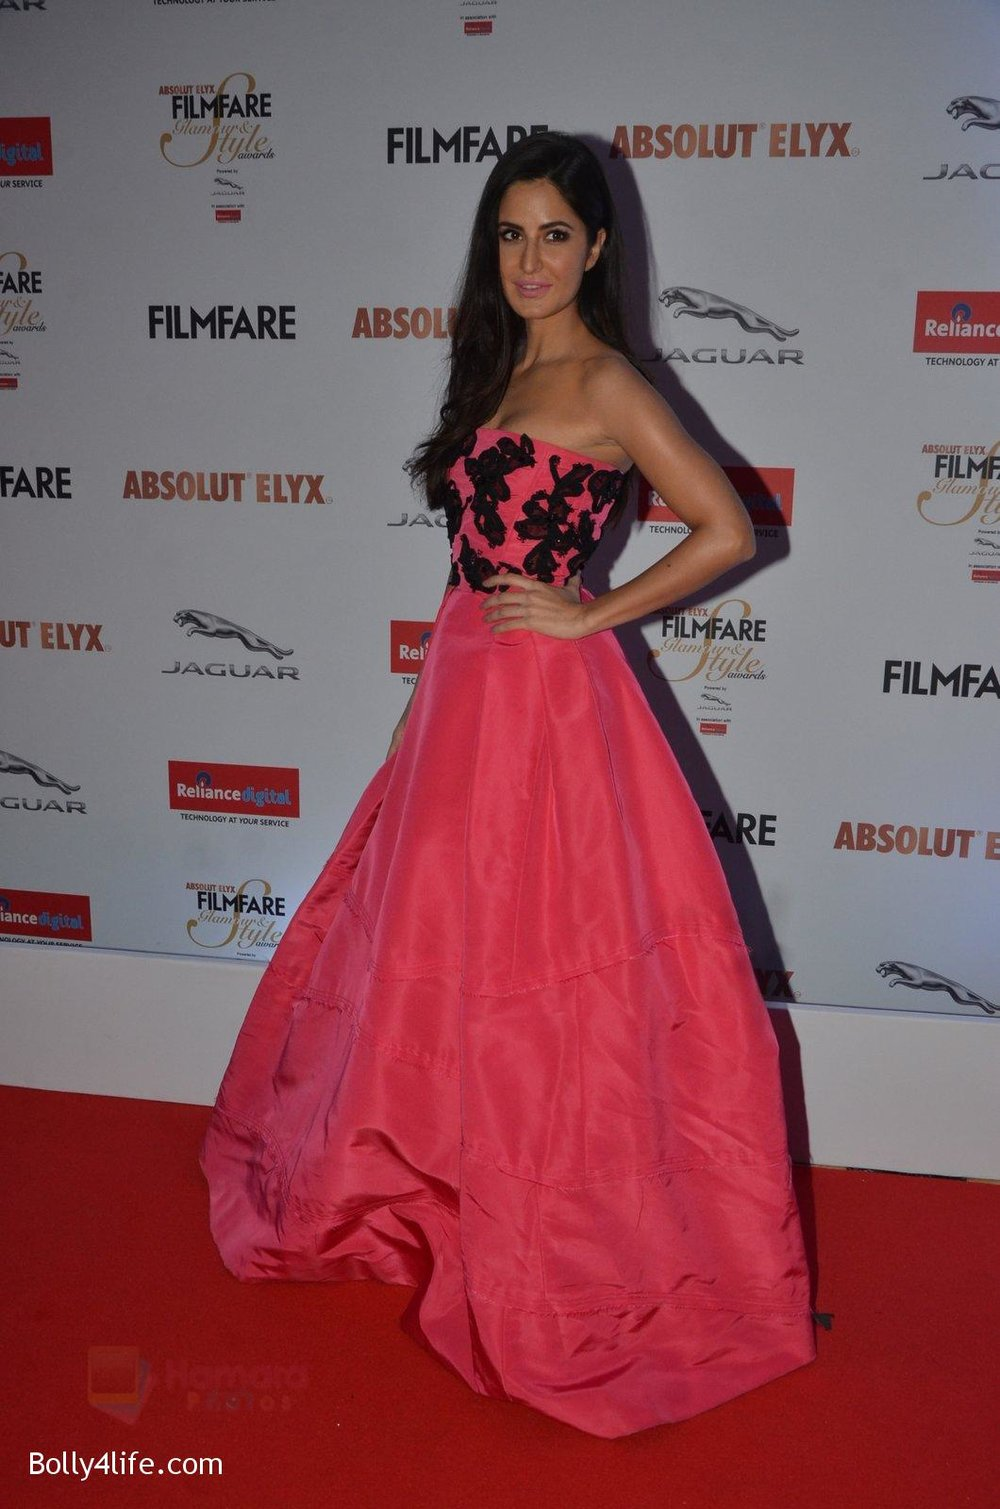 Katrina-Kaif-at-Filmfare-Glamour-Style-Awards-2016-in-Mumbai-on-15th-Oct-2016-1952.jpg